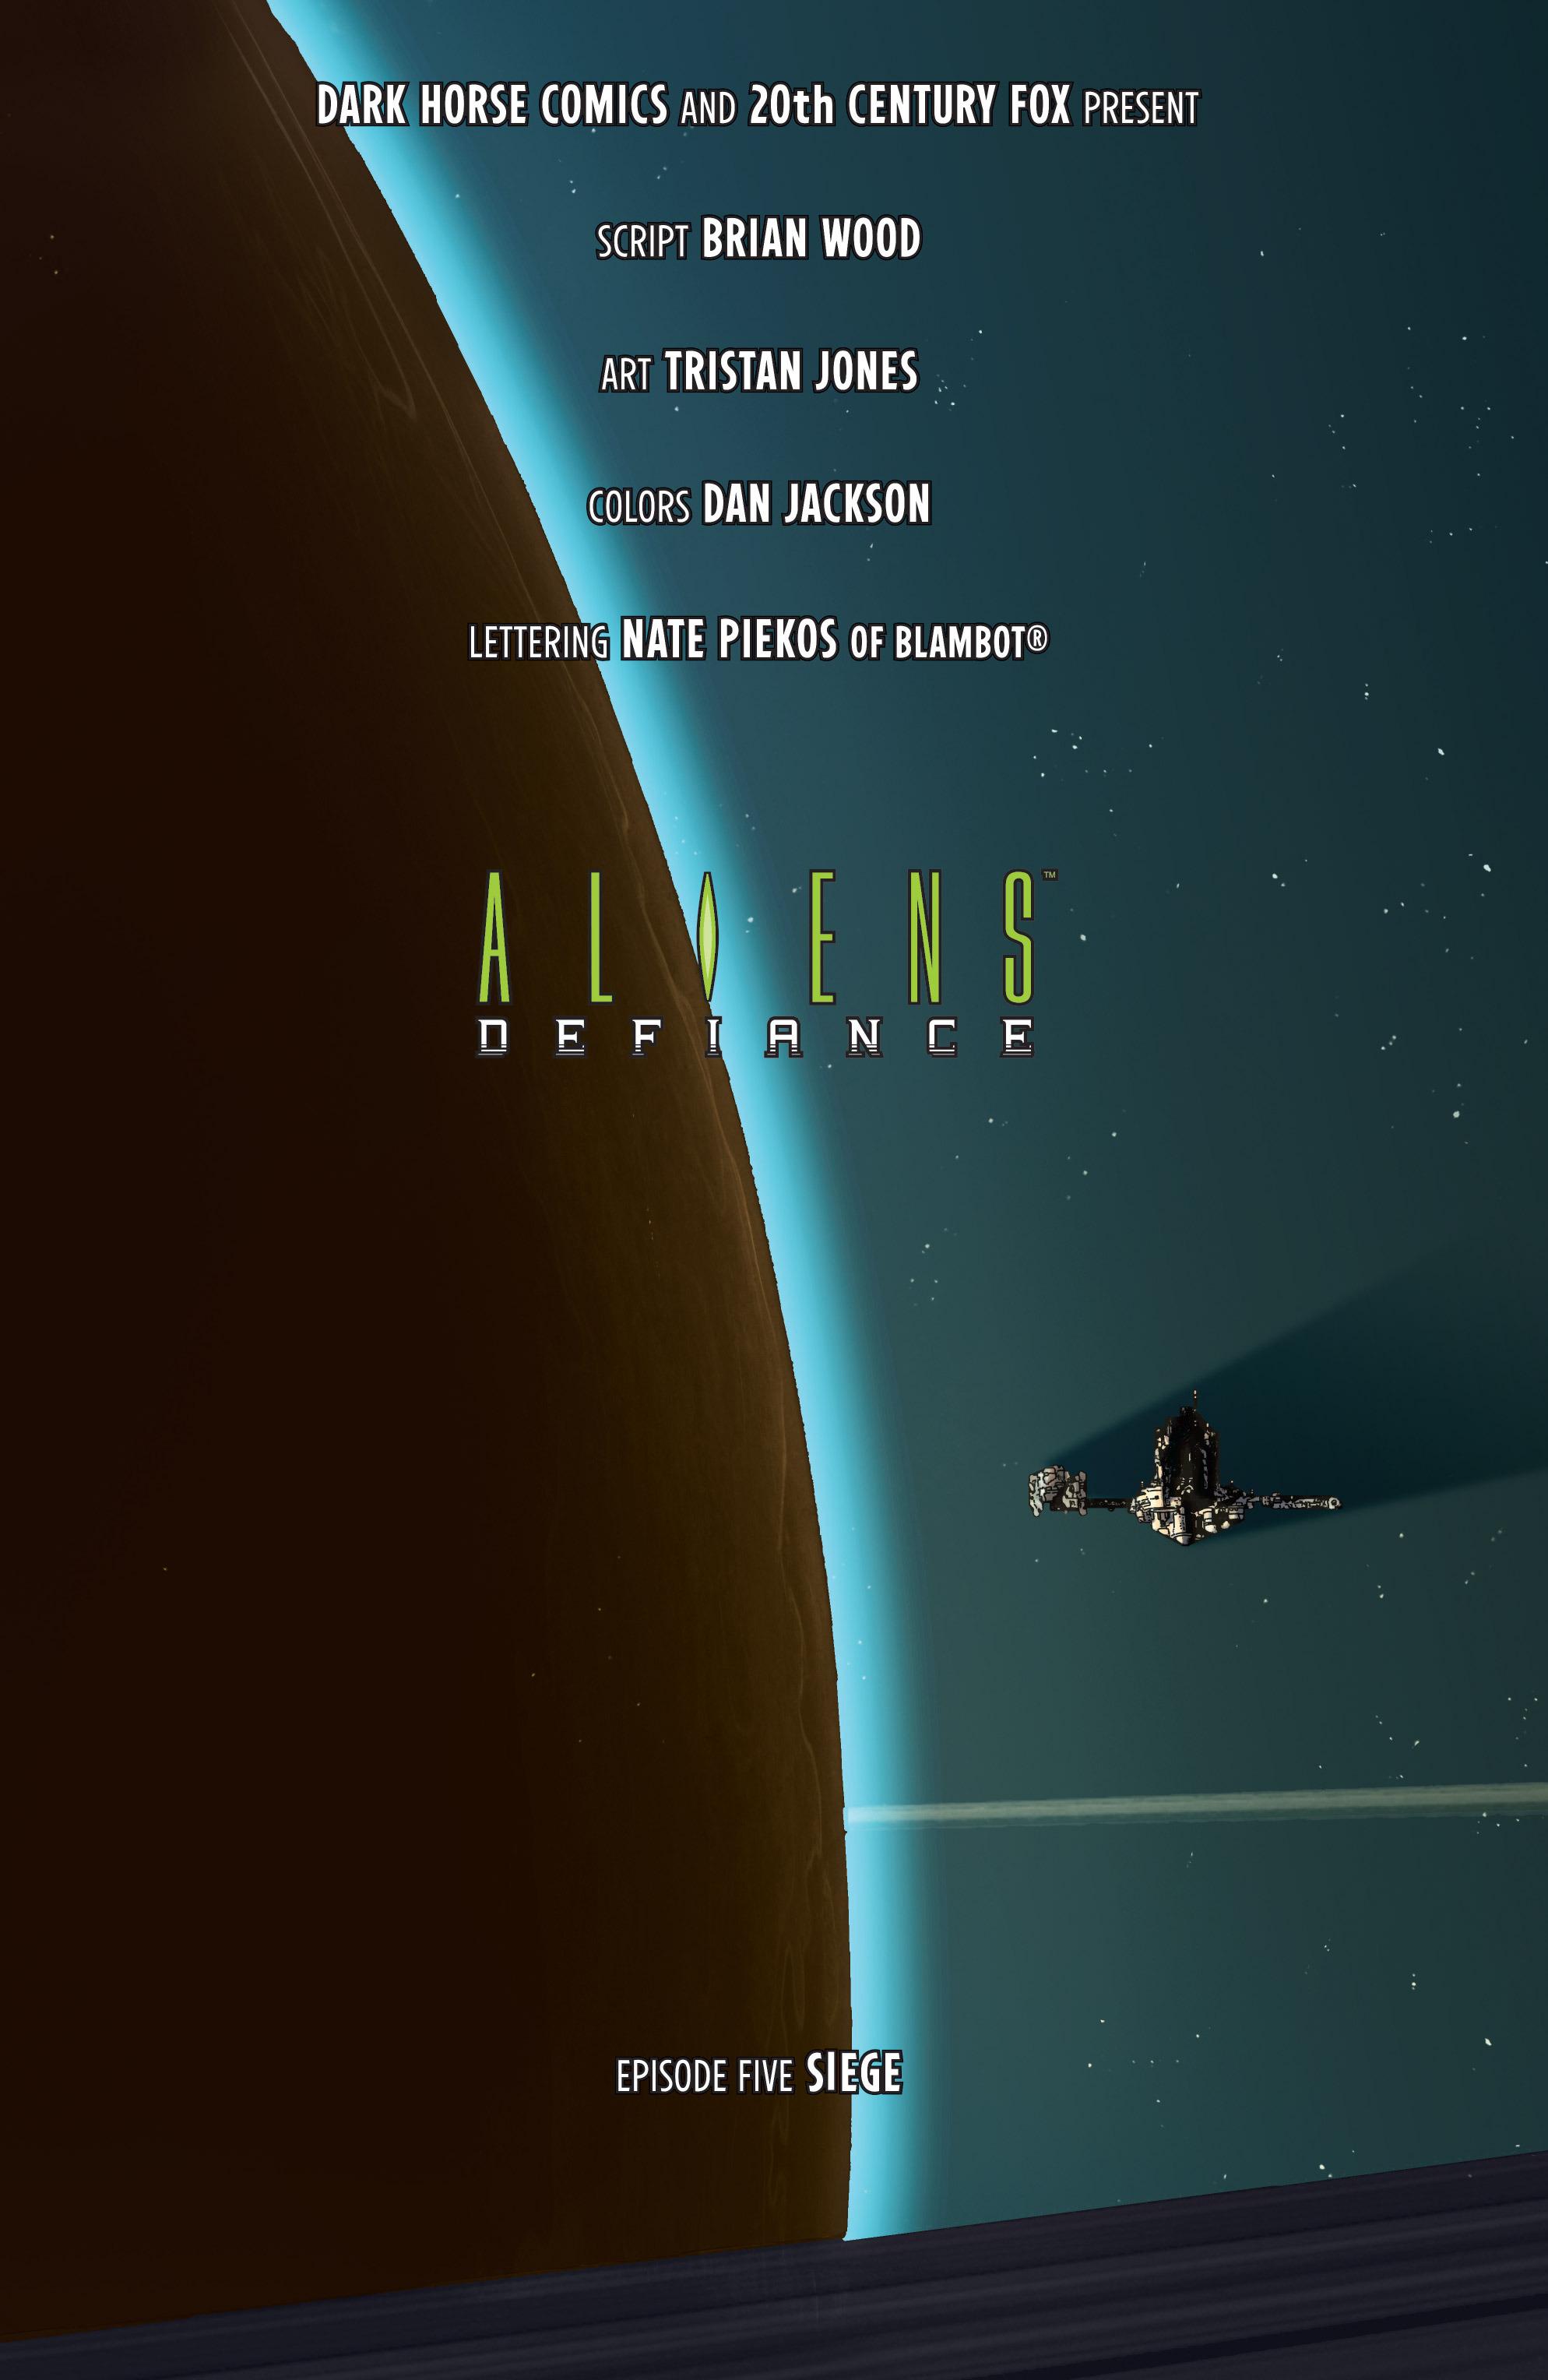 Read online Aliens: Defiance comic -  Issue #5 - 7